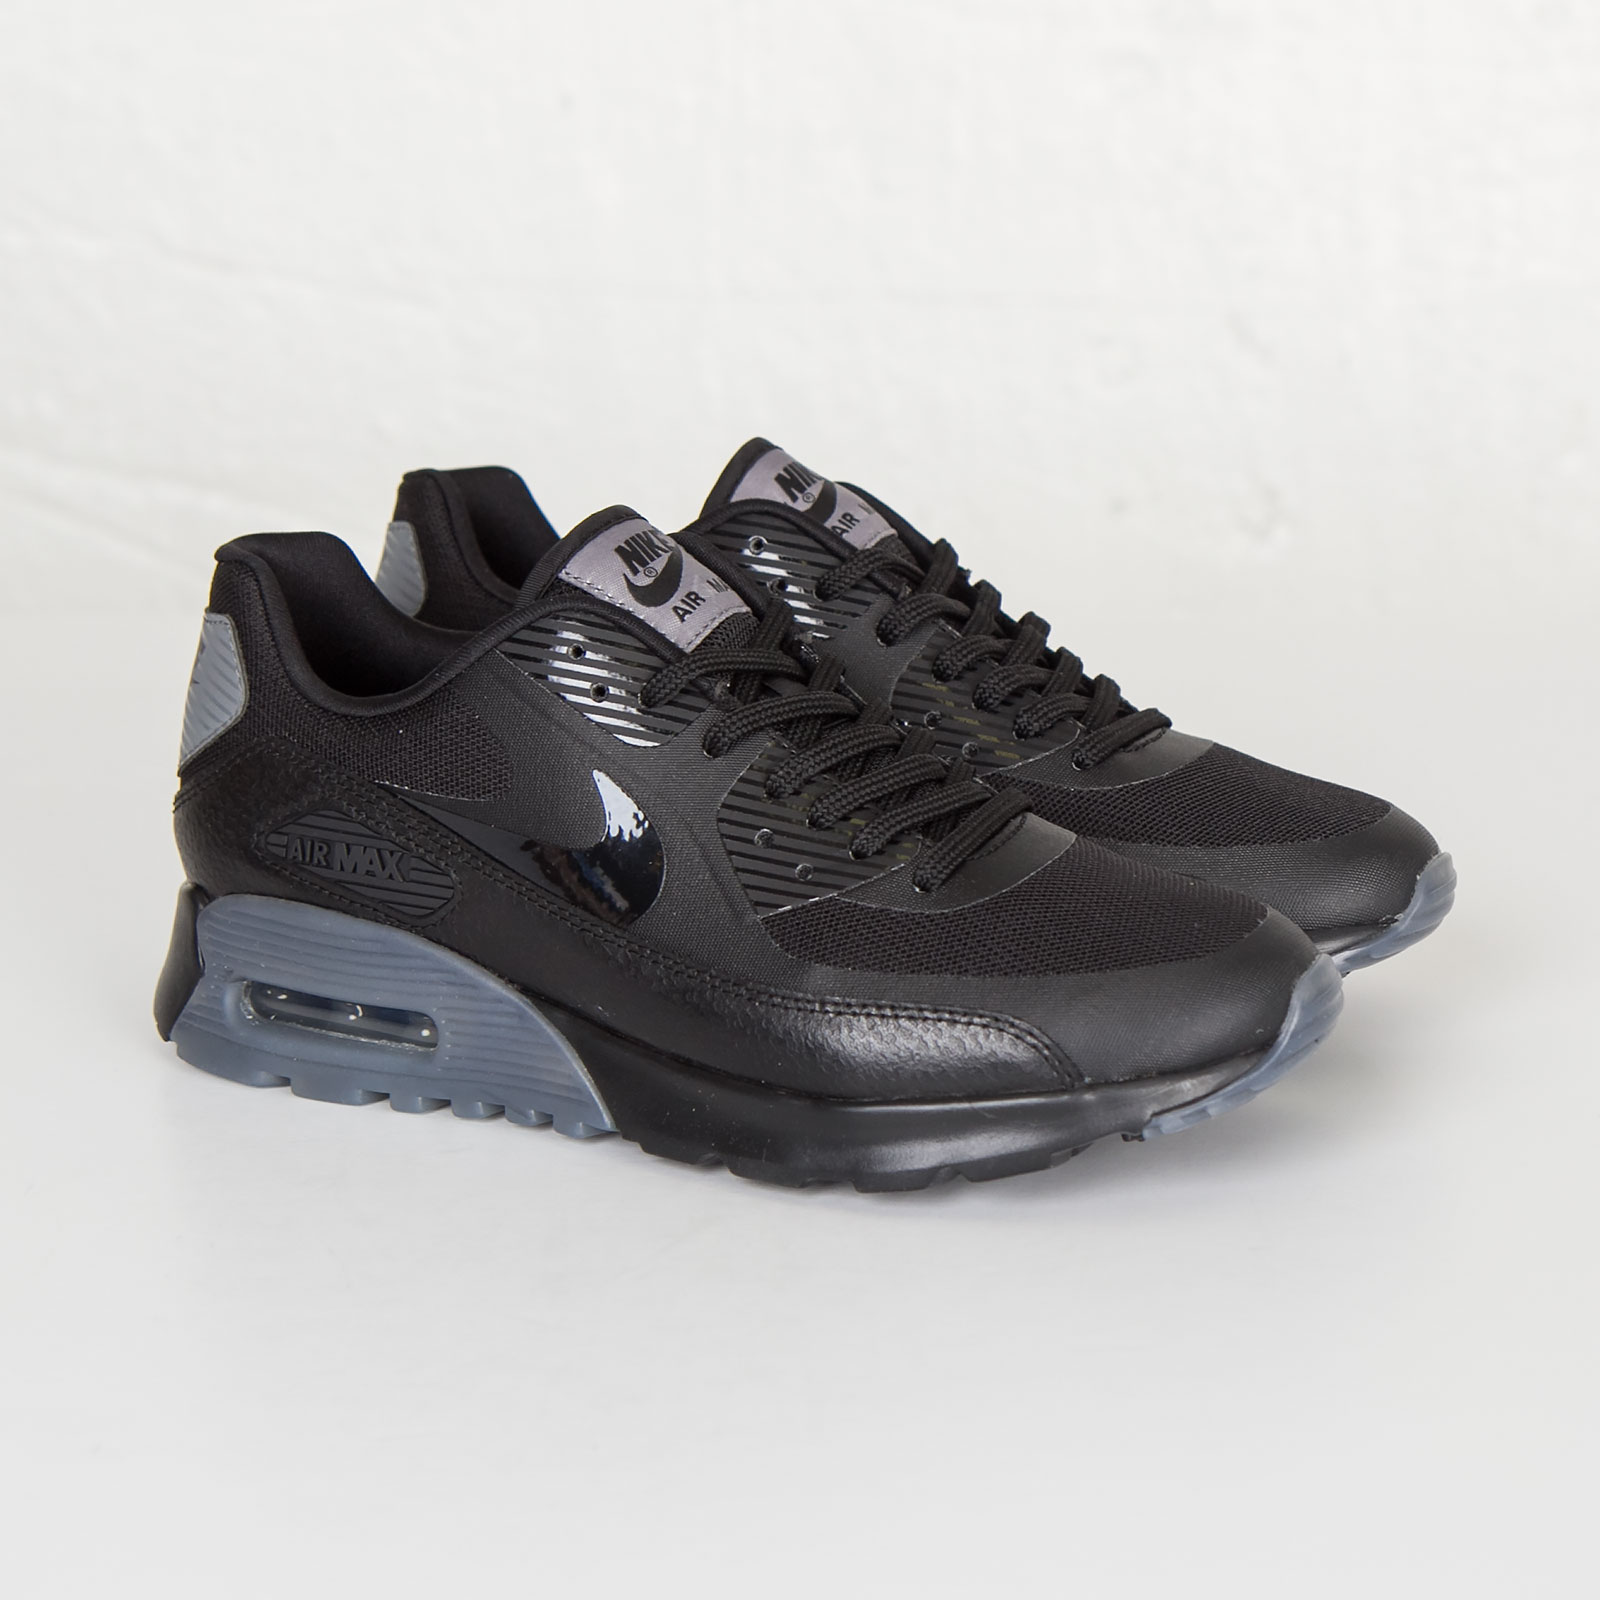 67a7309c699a Nike W Air Max 90 Ultra Essential - 724981-005 - Sneakersnstuff ...